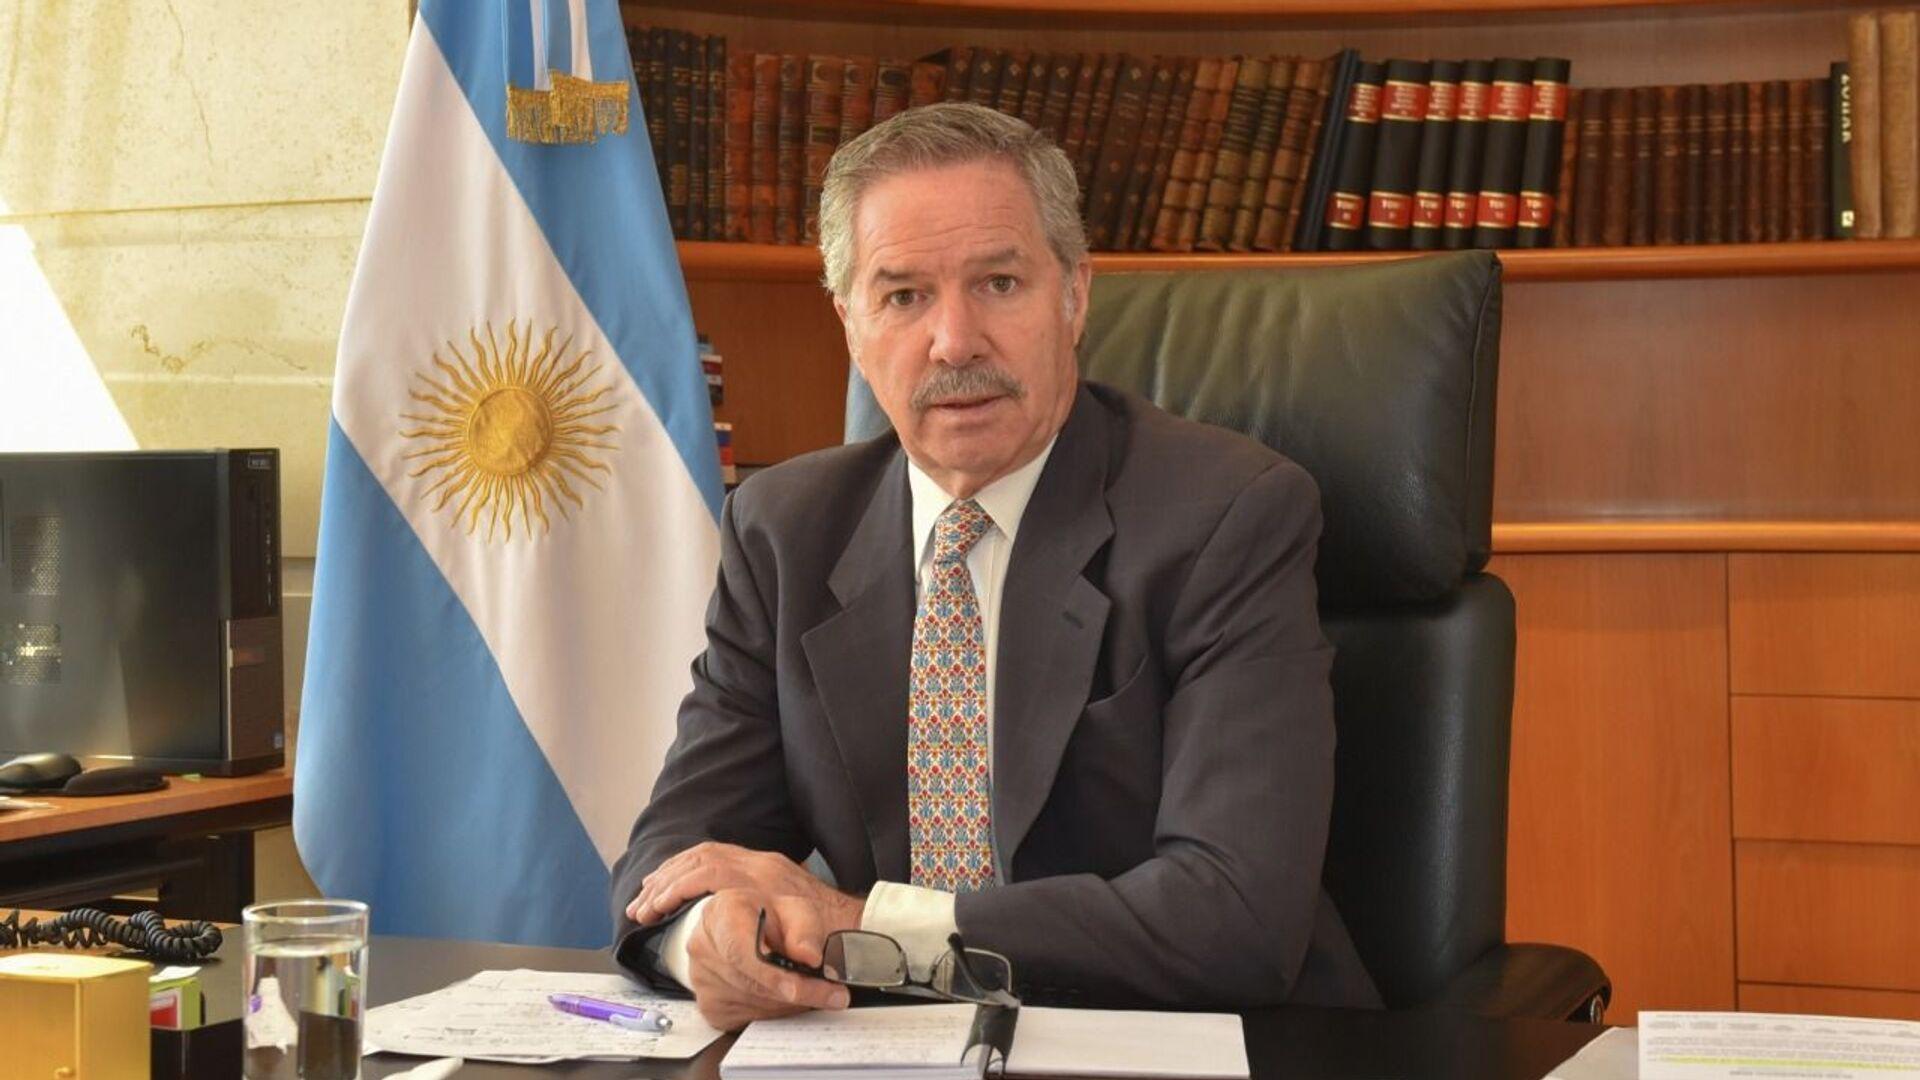 Felipe Solá, el ministro argentino de Relaciones Exteriores  - Sputnik Mundo, 1920, 05.07.2021